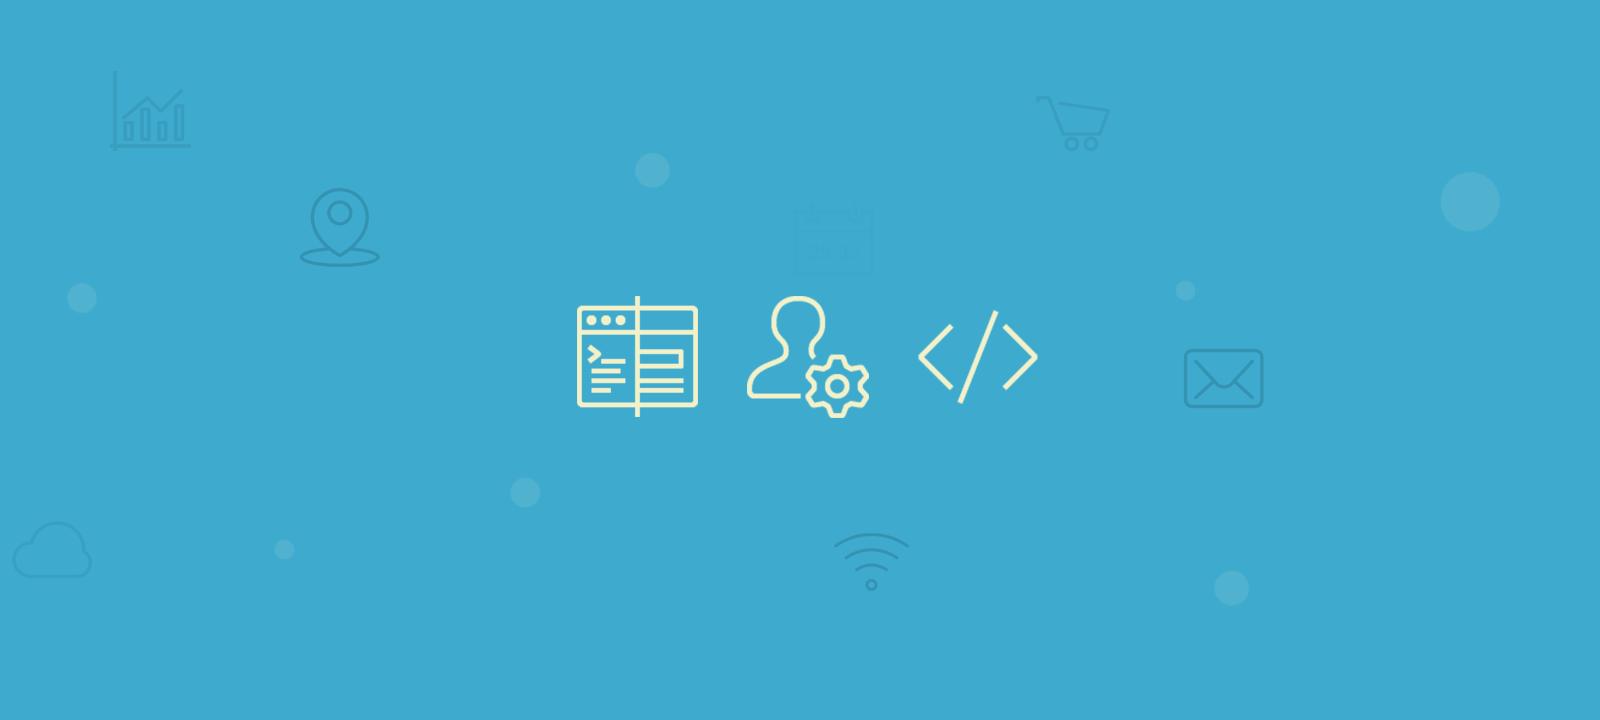 creating wordpress users programmatically